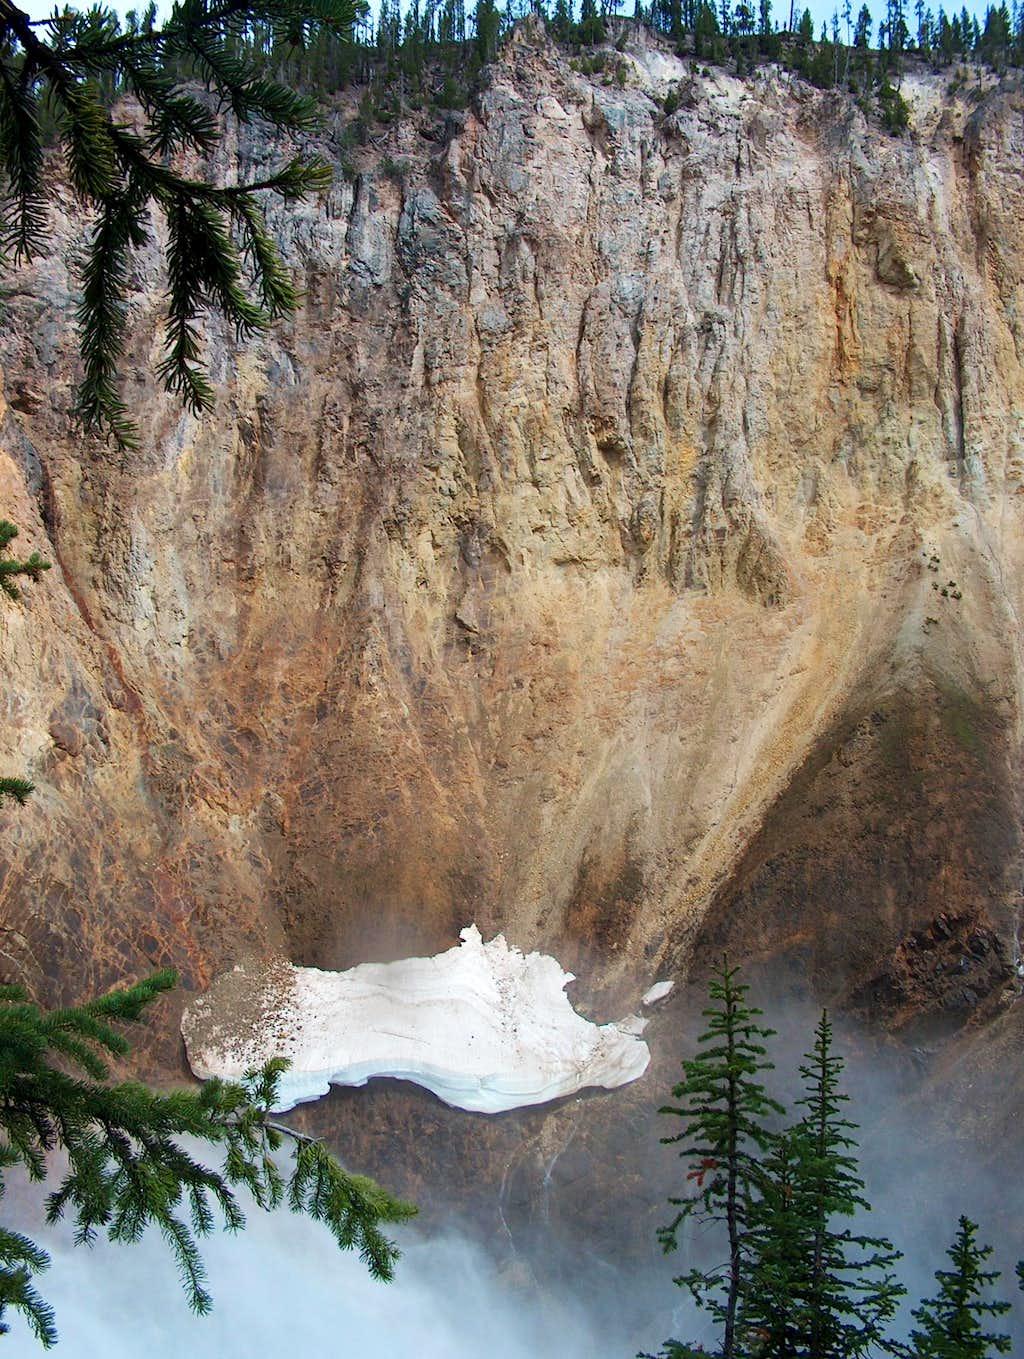 Snow Ledge above Yellowstone Falls